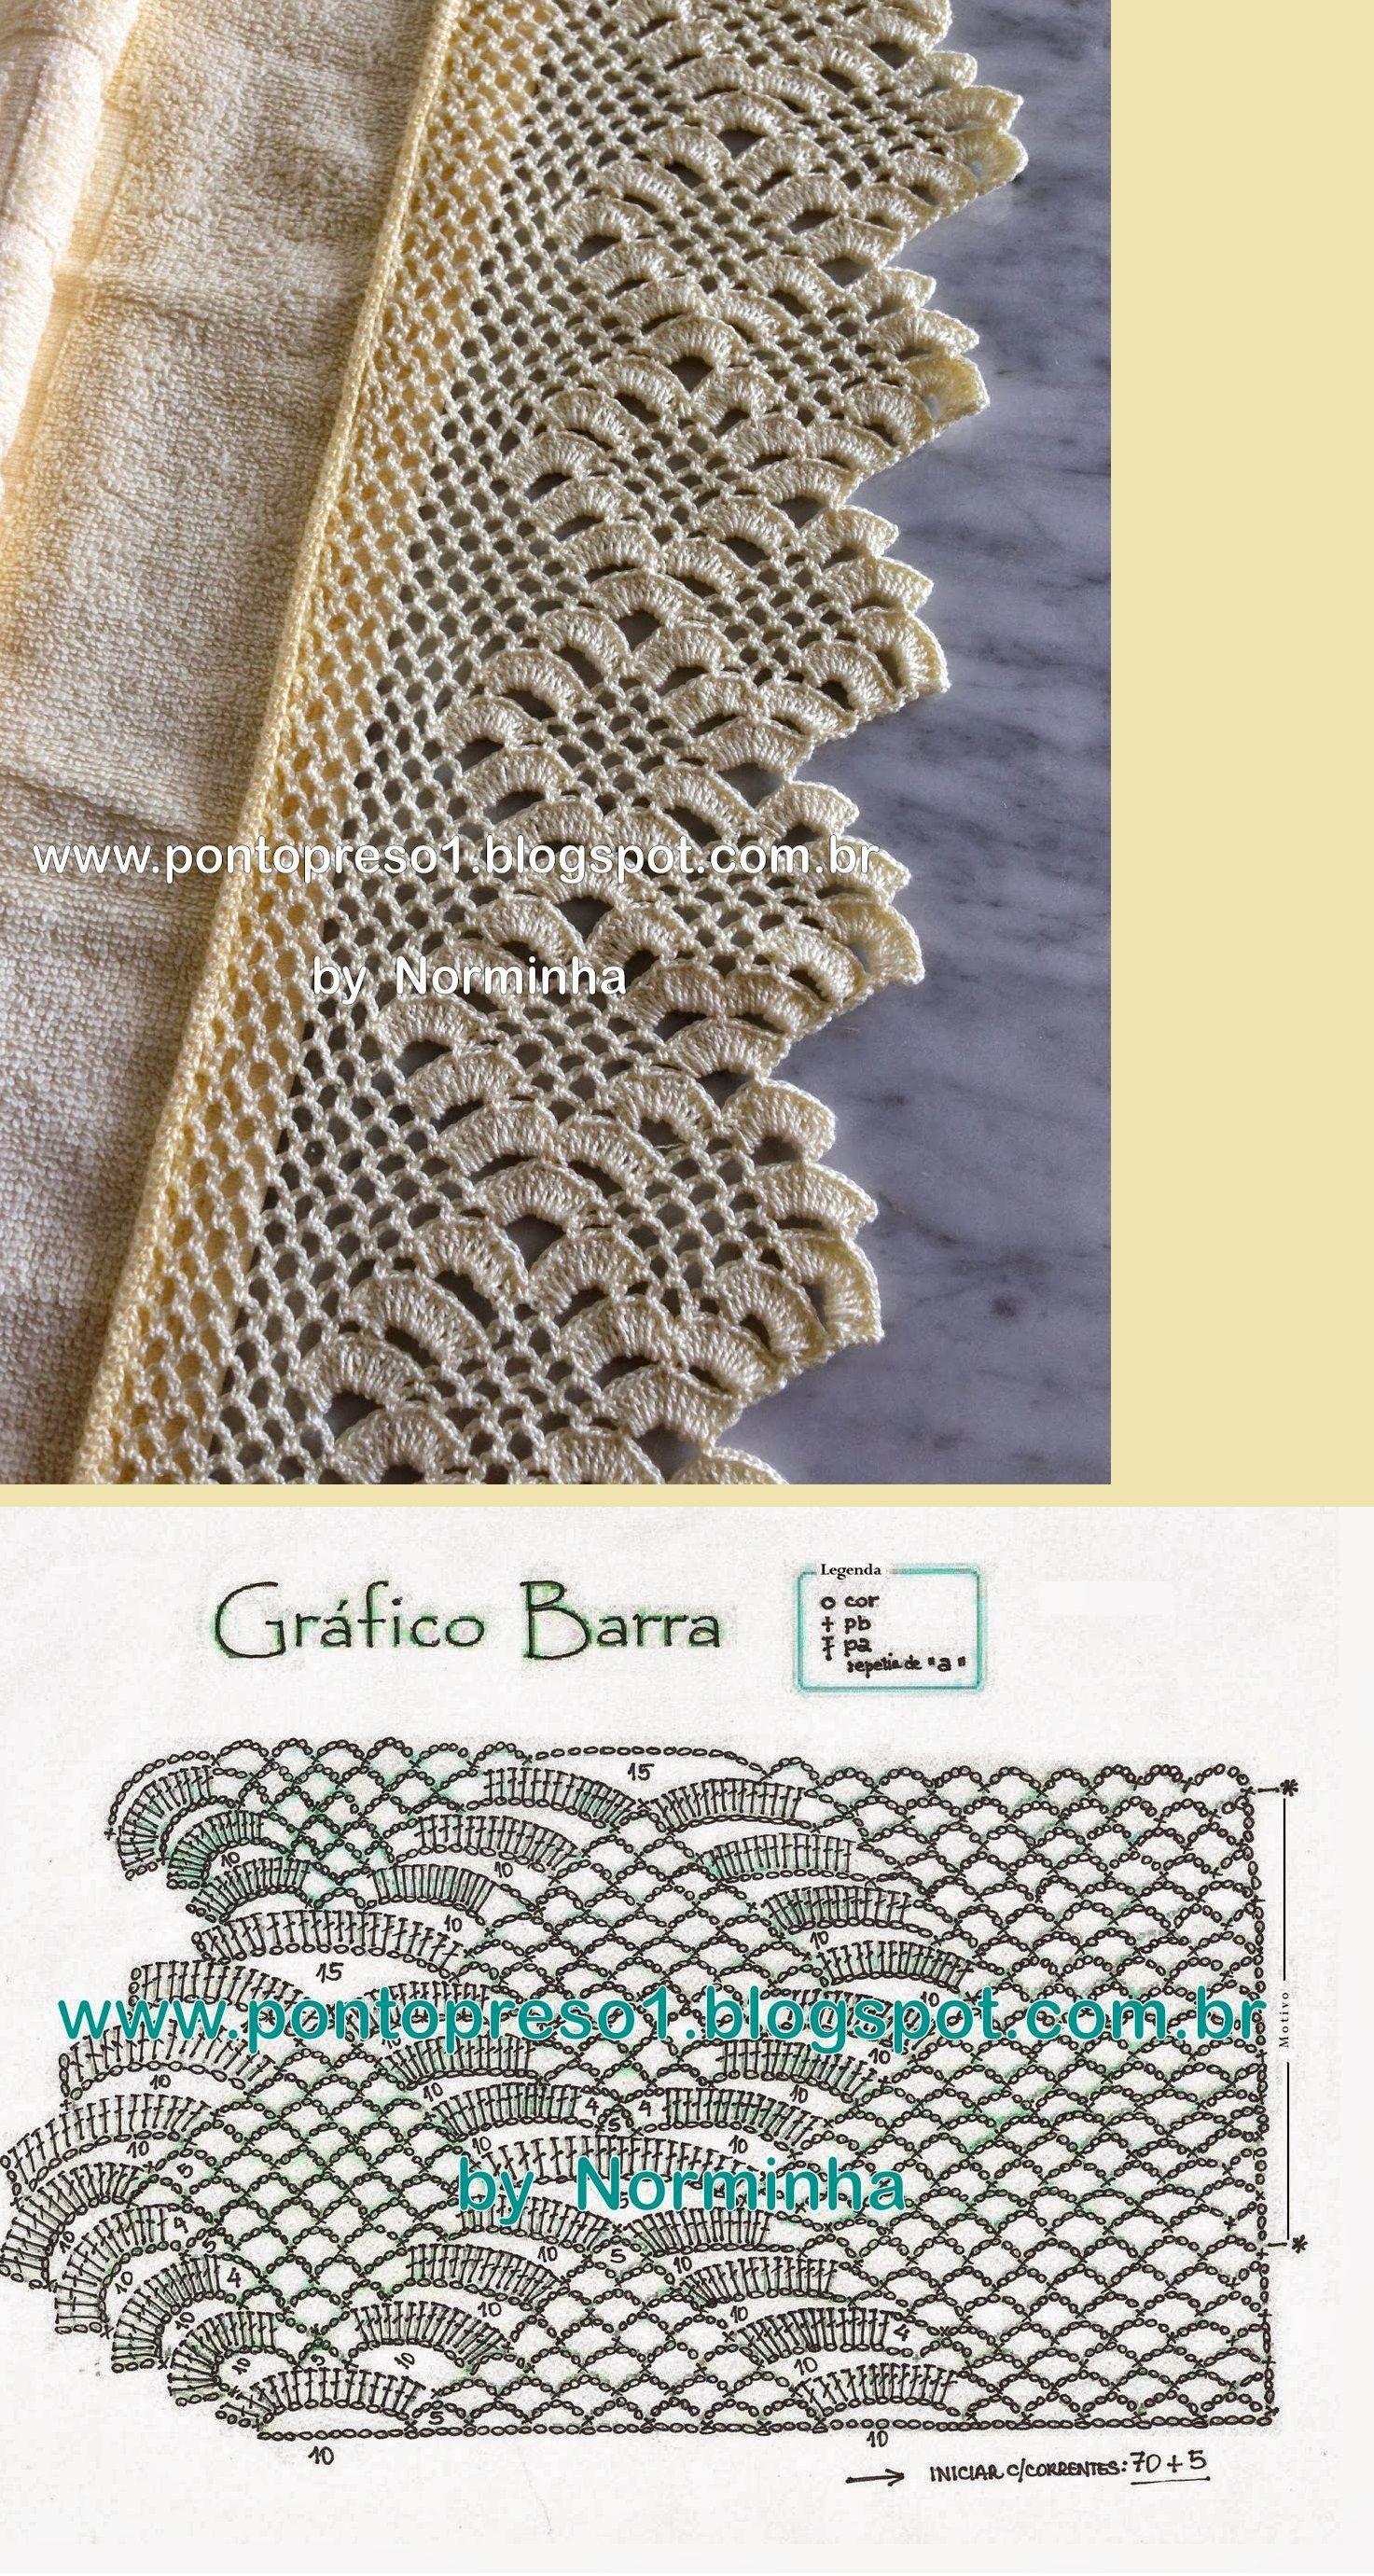 Crochet Lace Edging More | Crochet patterns | Pinterest | Häkeln